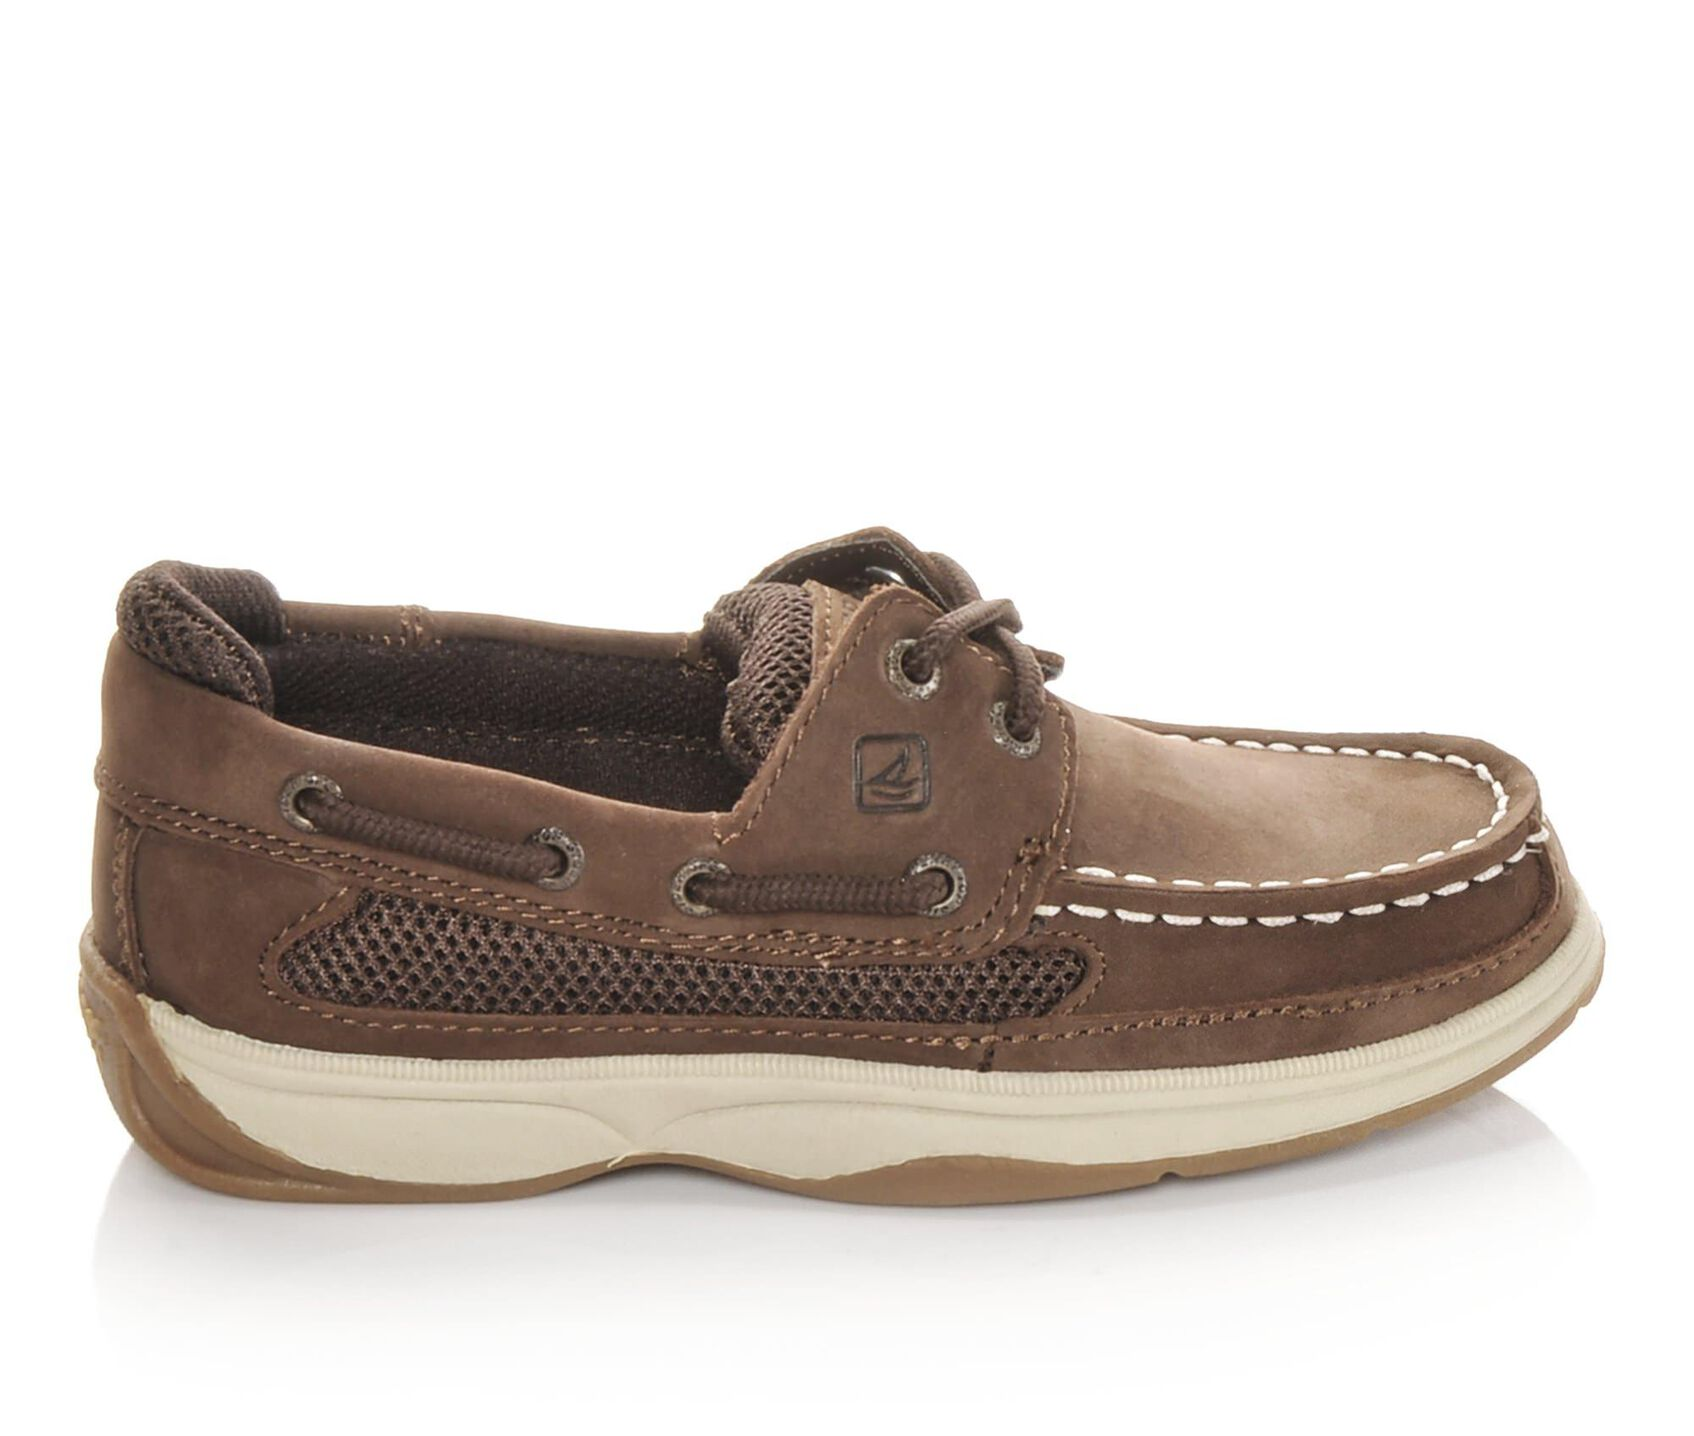 9b327eb9d946 Boys  Sperry Little Kid   Big Kid Lanyard Boat Shoes